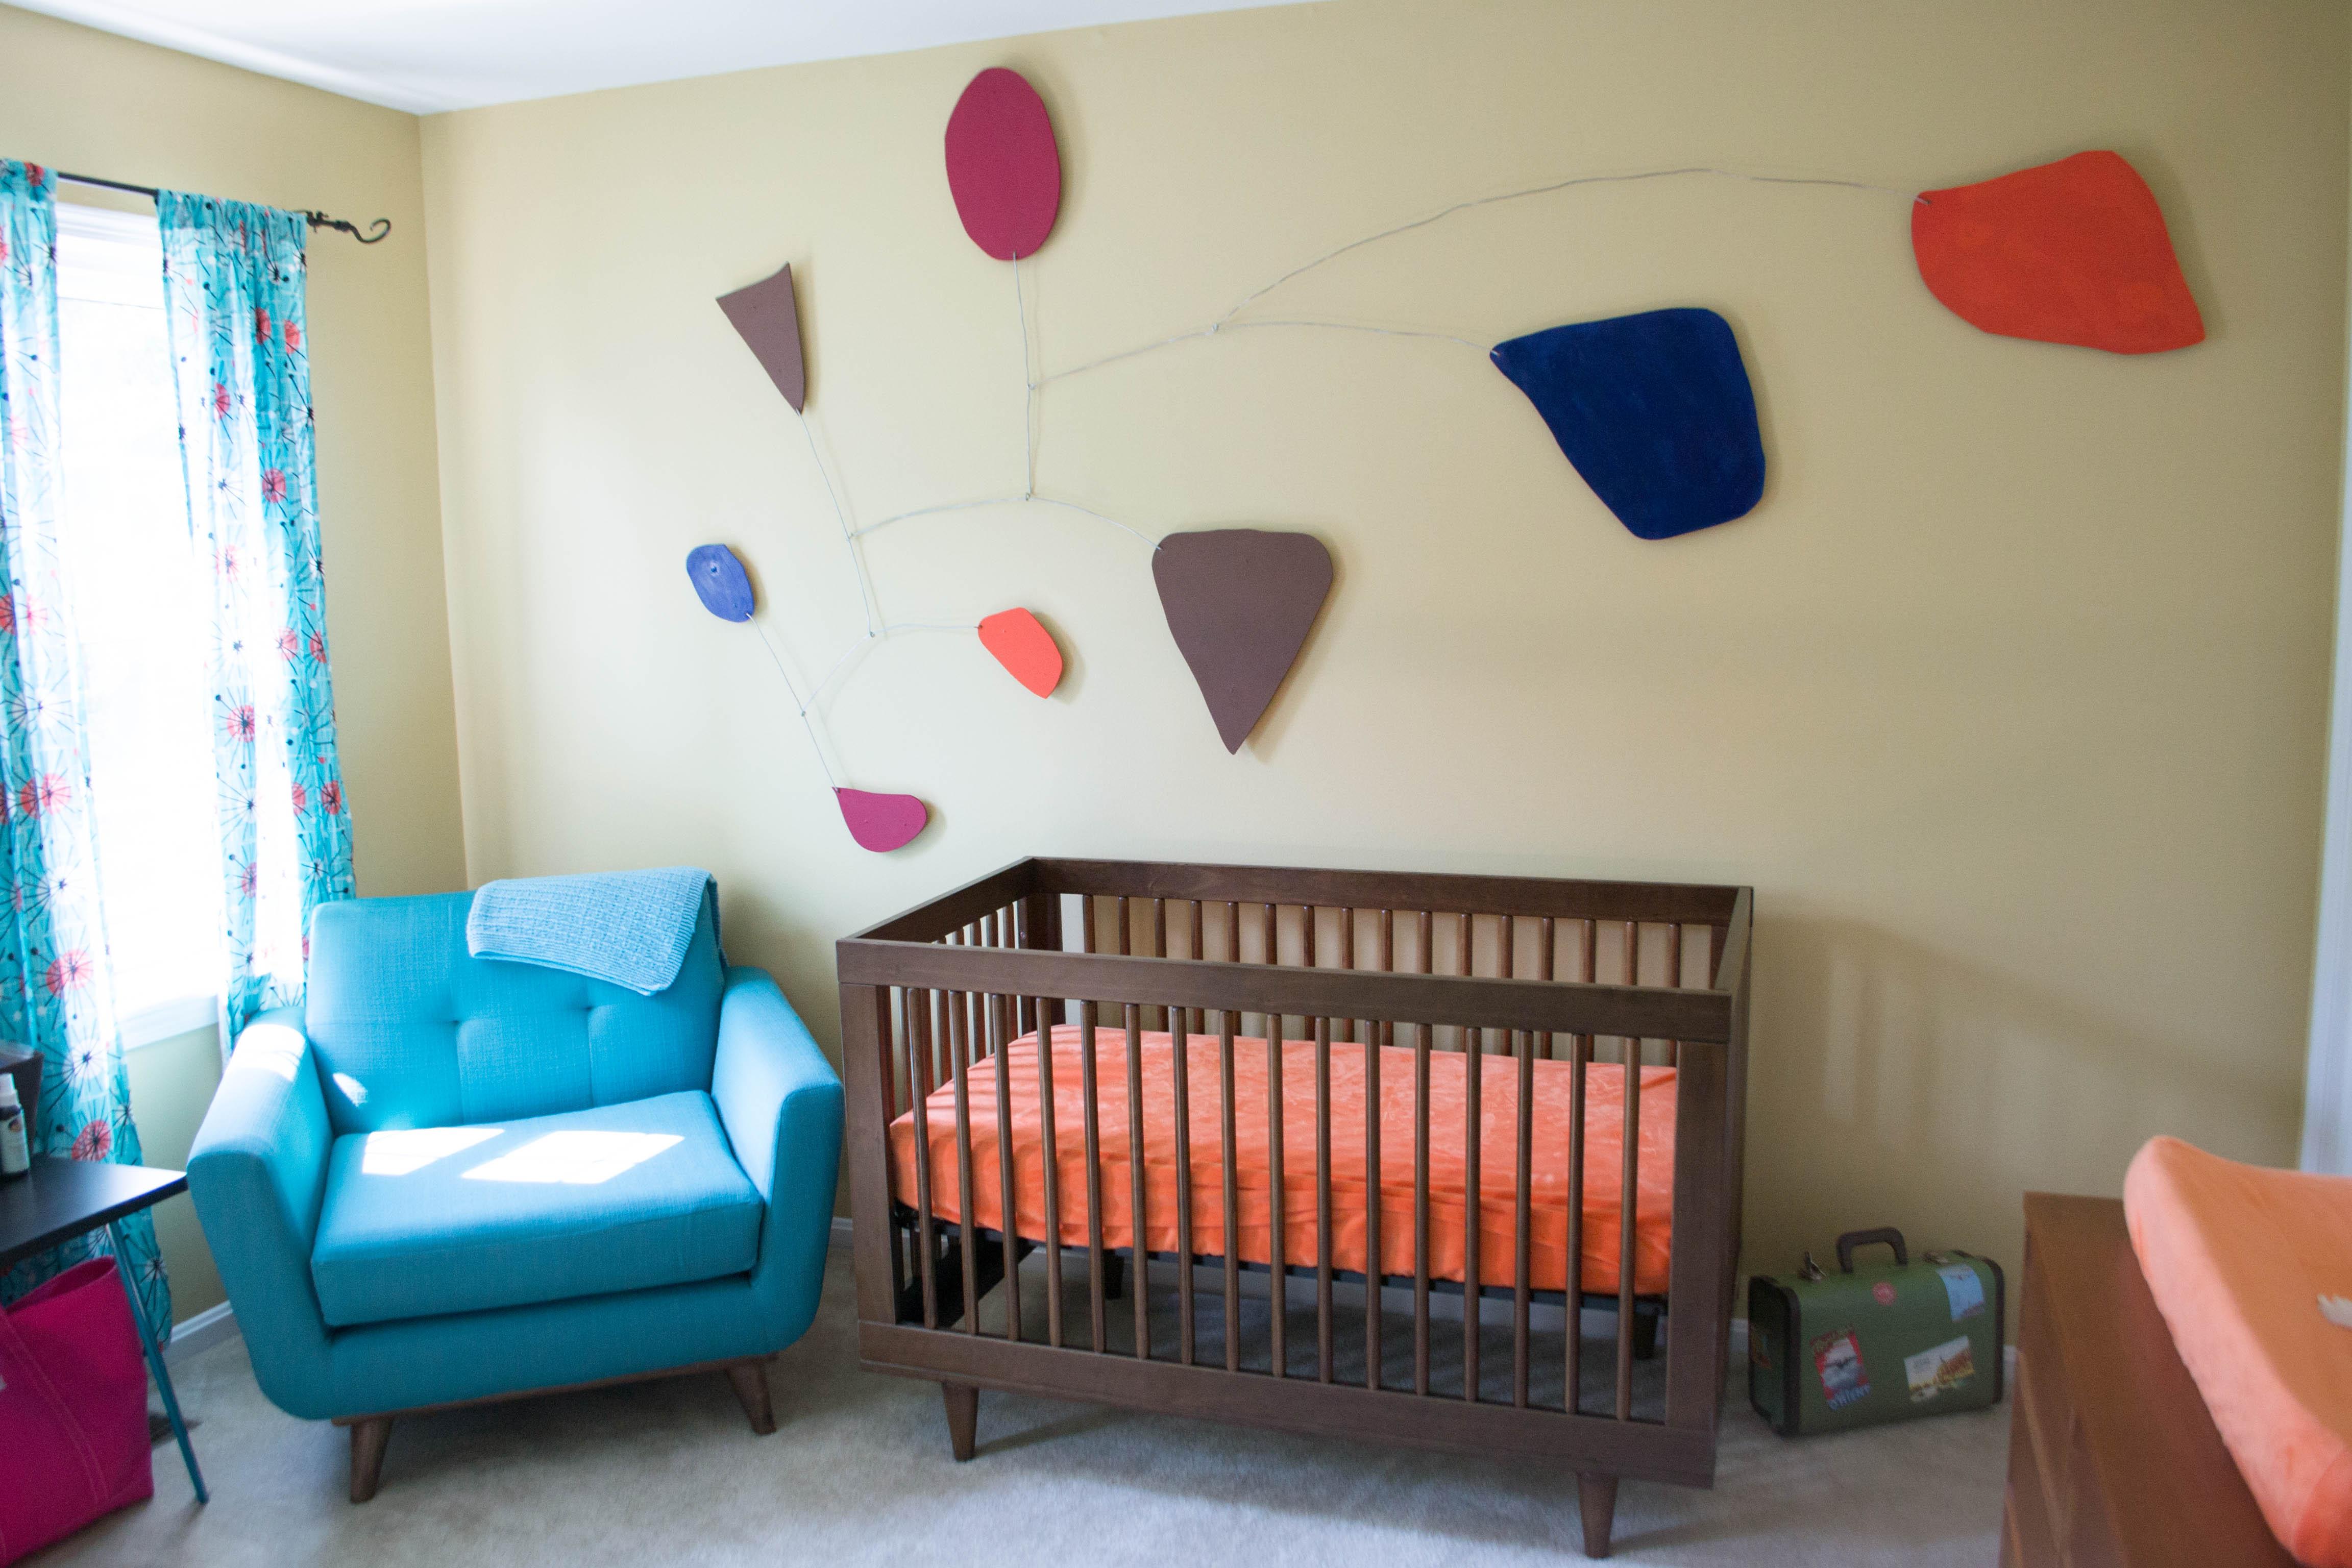 Mid century modern nursery budget friendly project nursery - How to decorate mid century modern on a budget ...